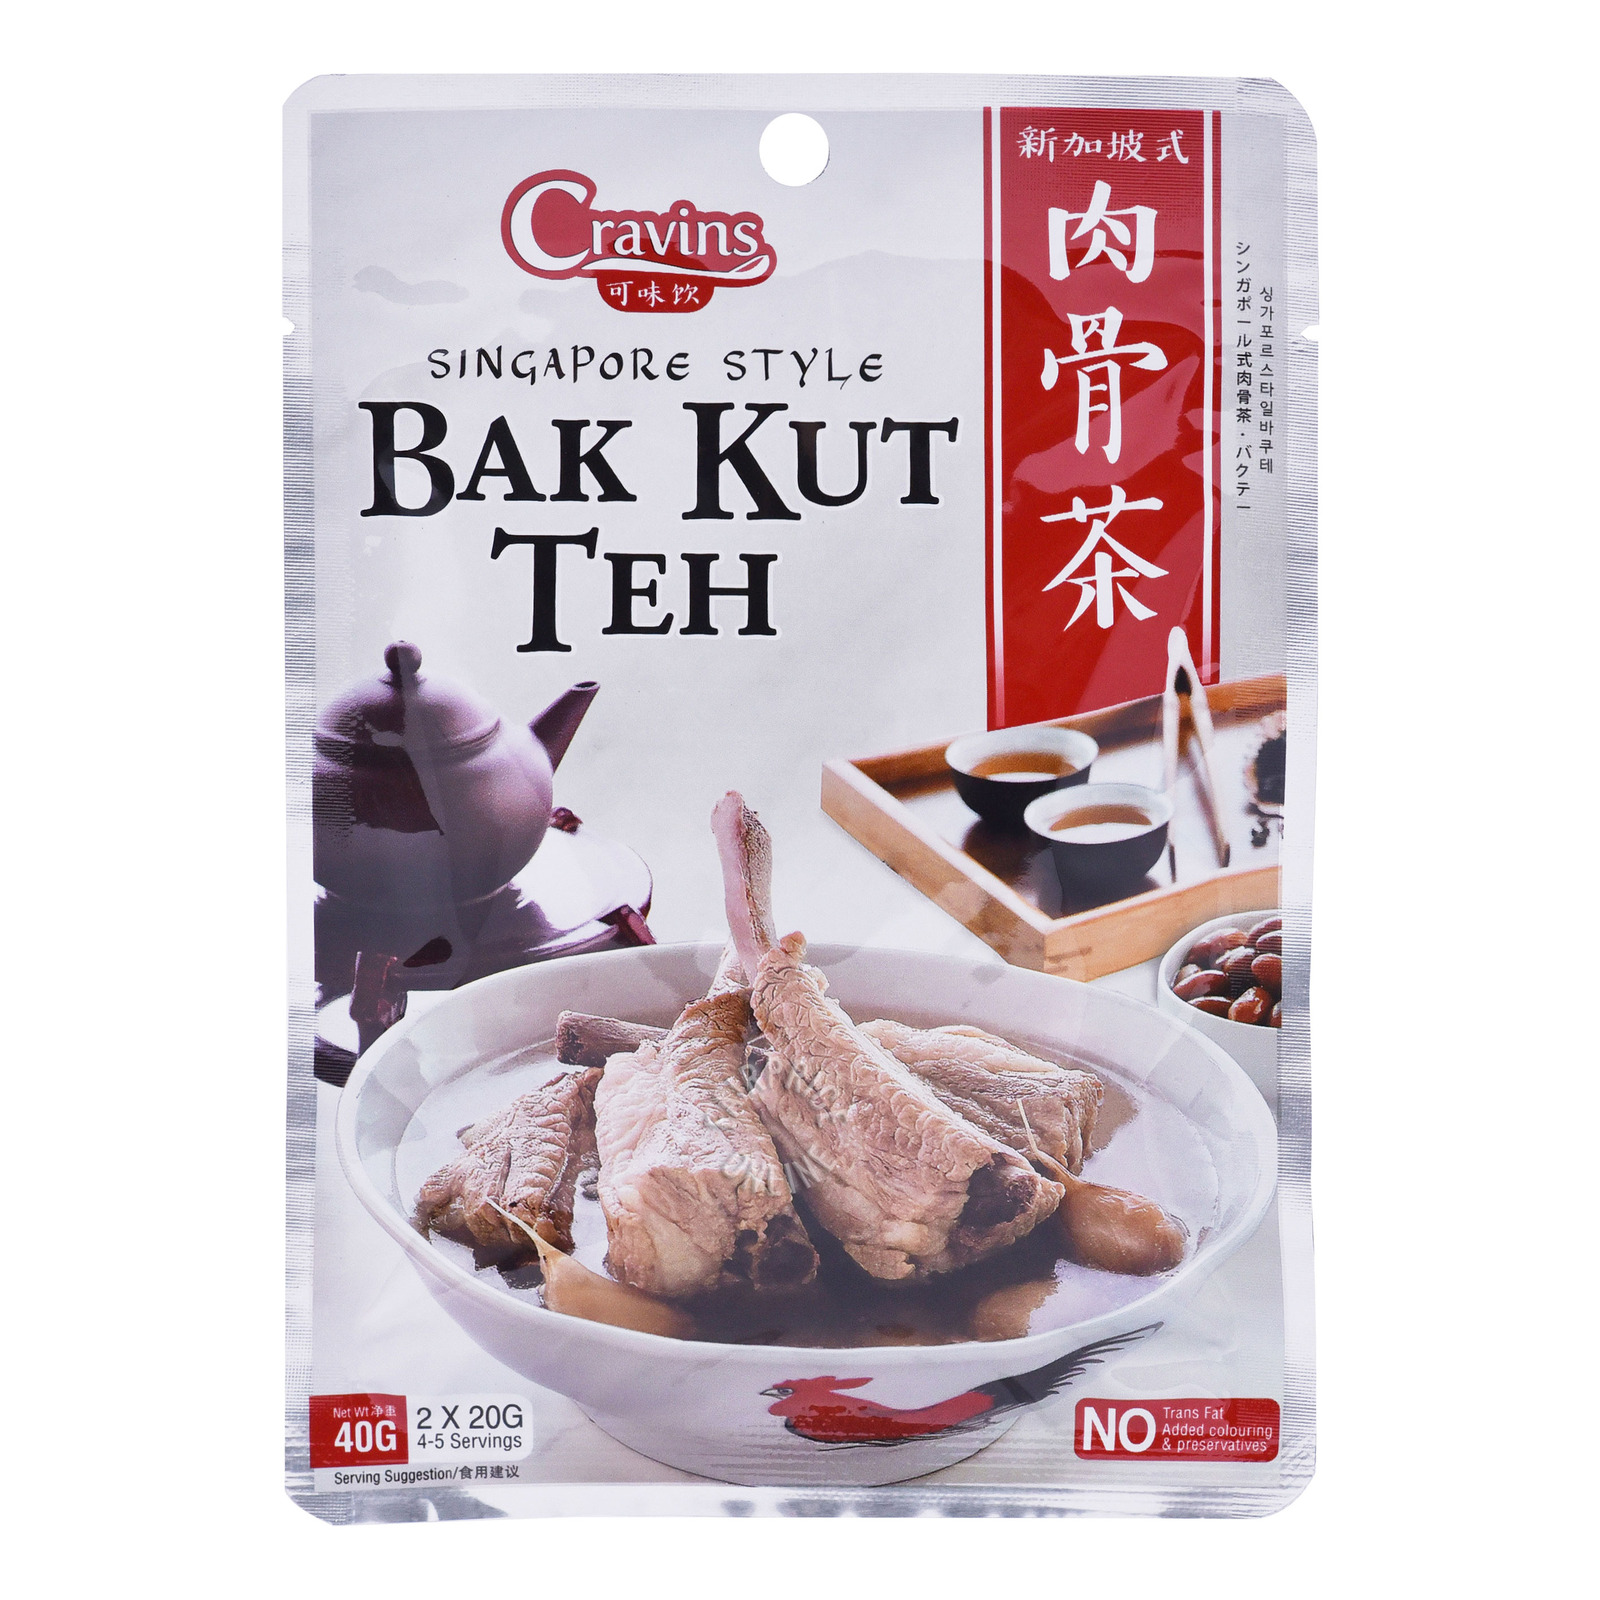 Cravins Bak Kut Teh Ready Broth - Singapore Style